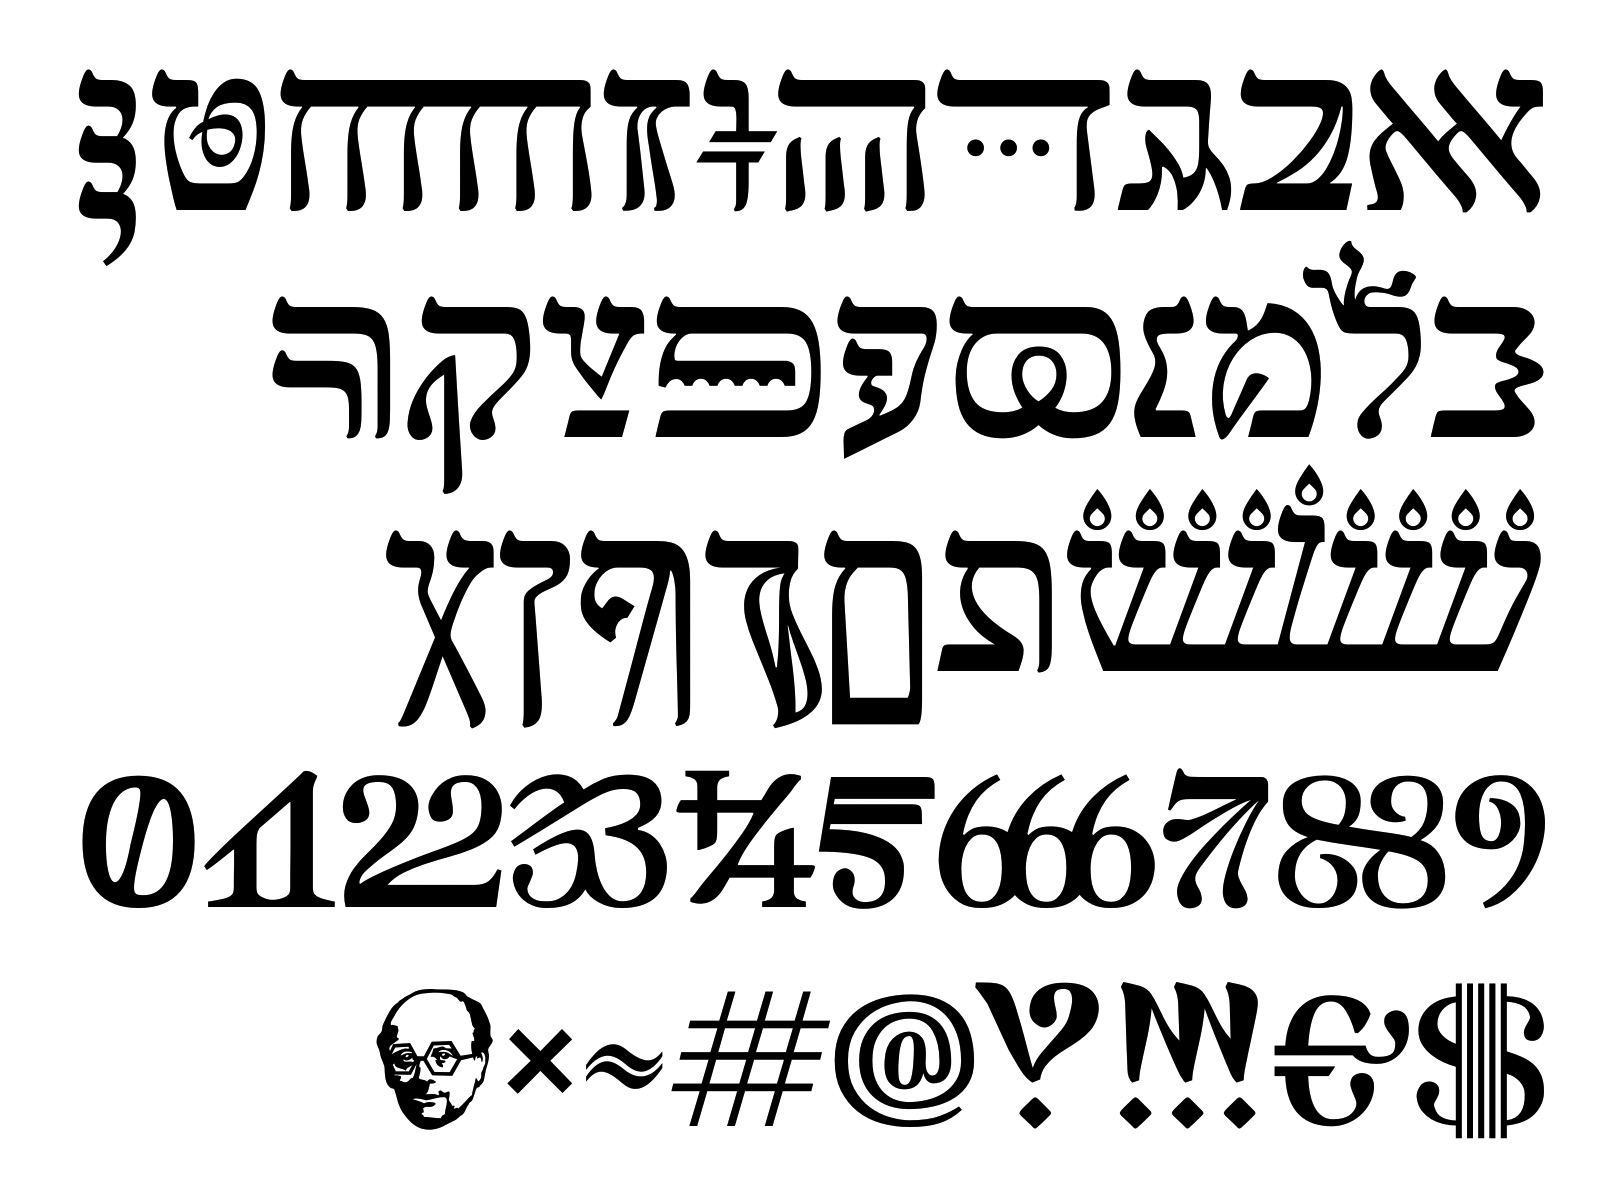 Avraham3